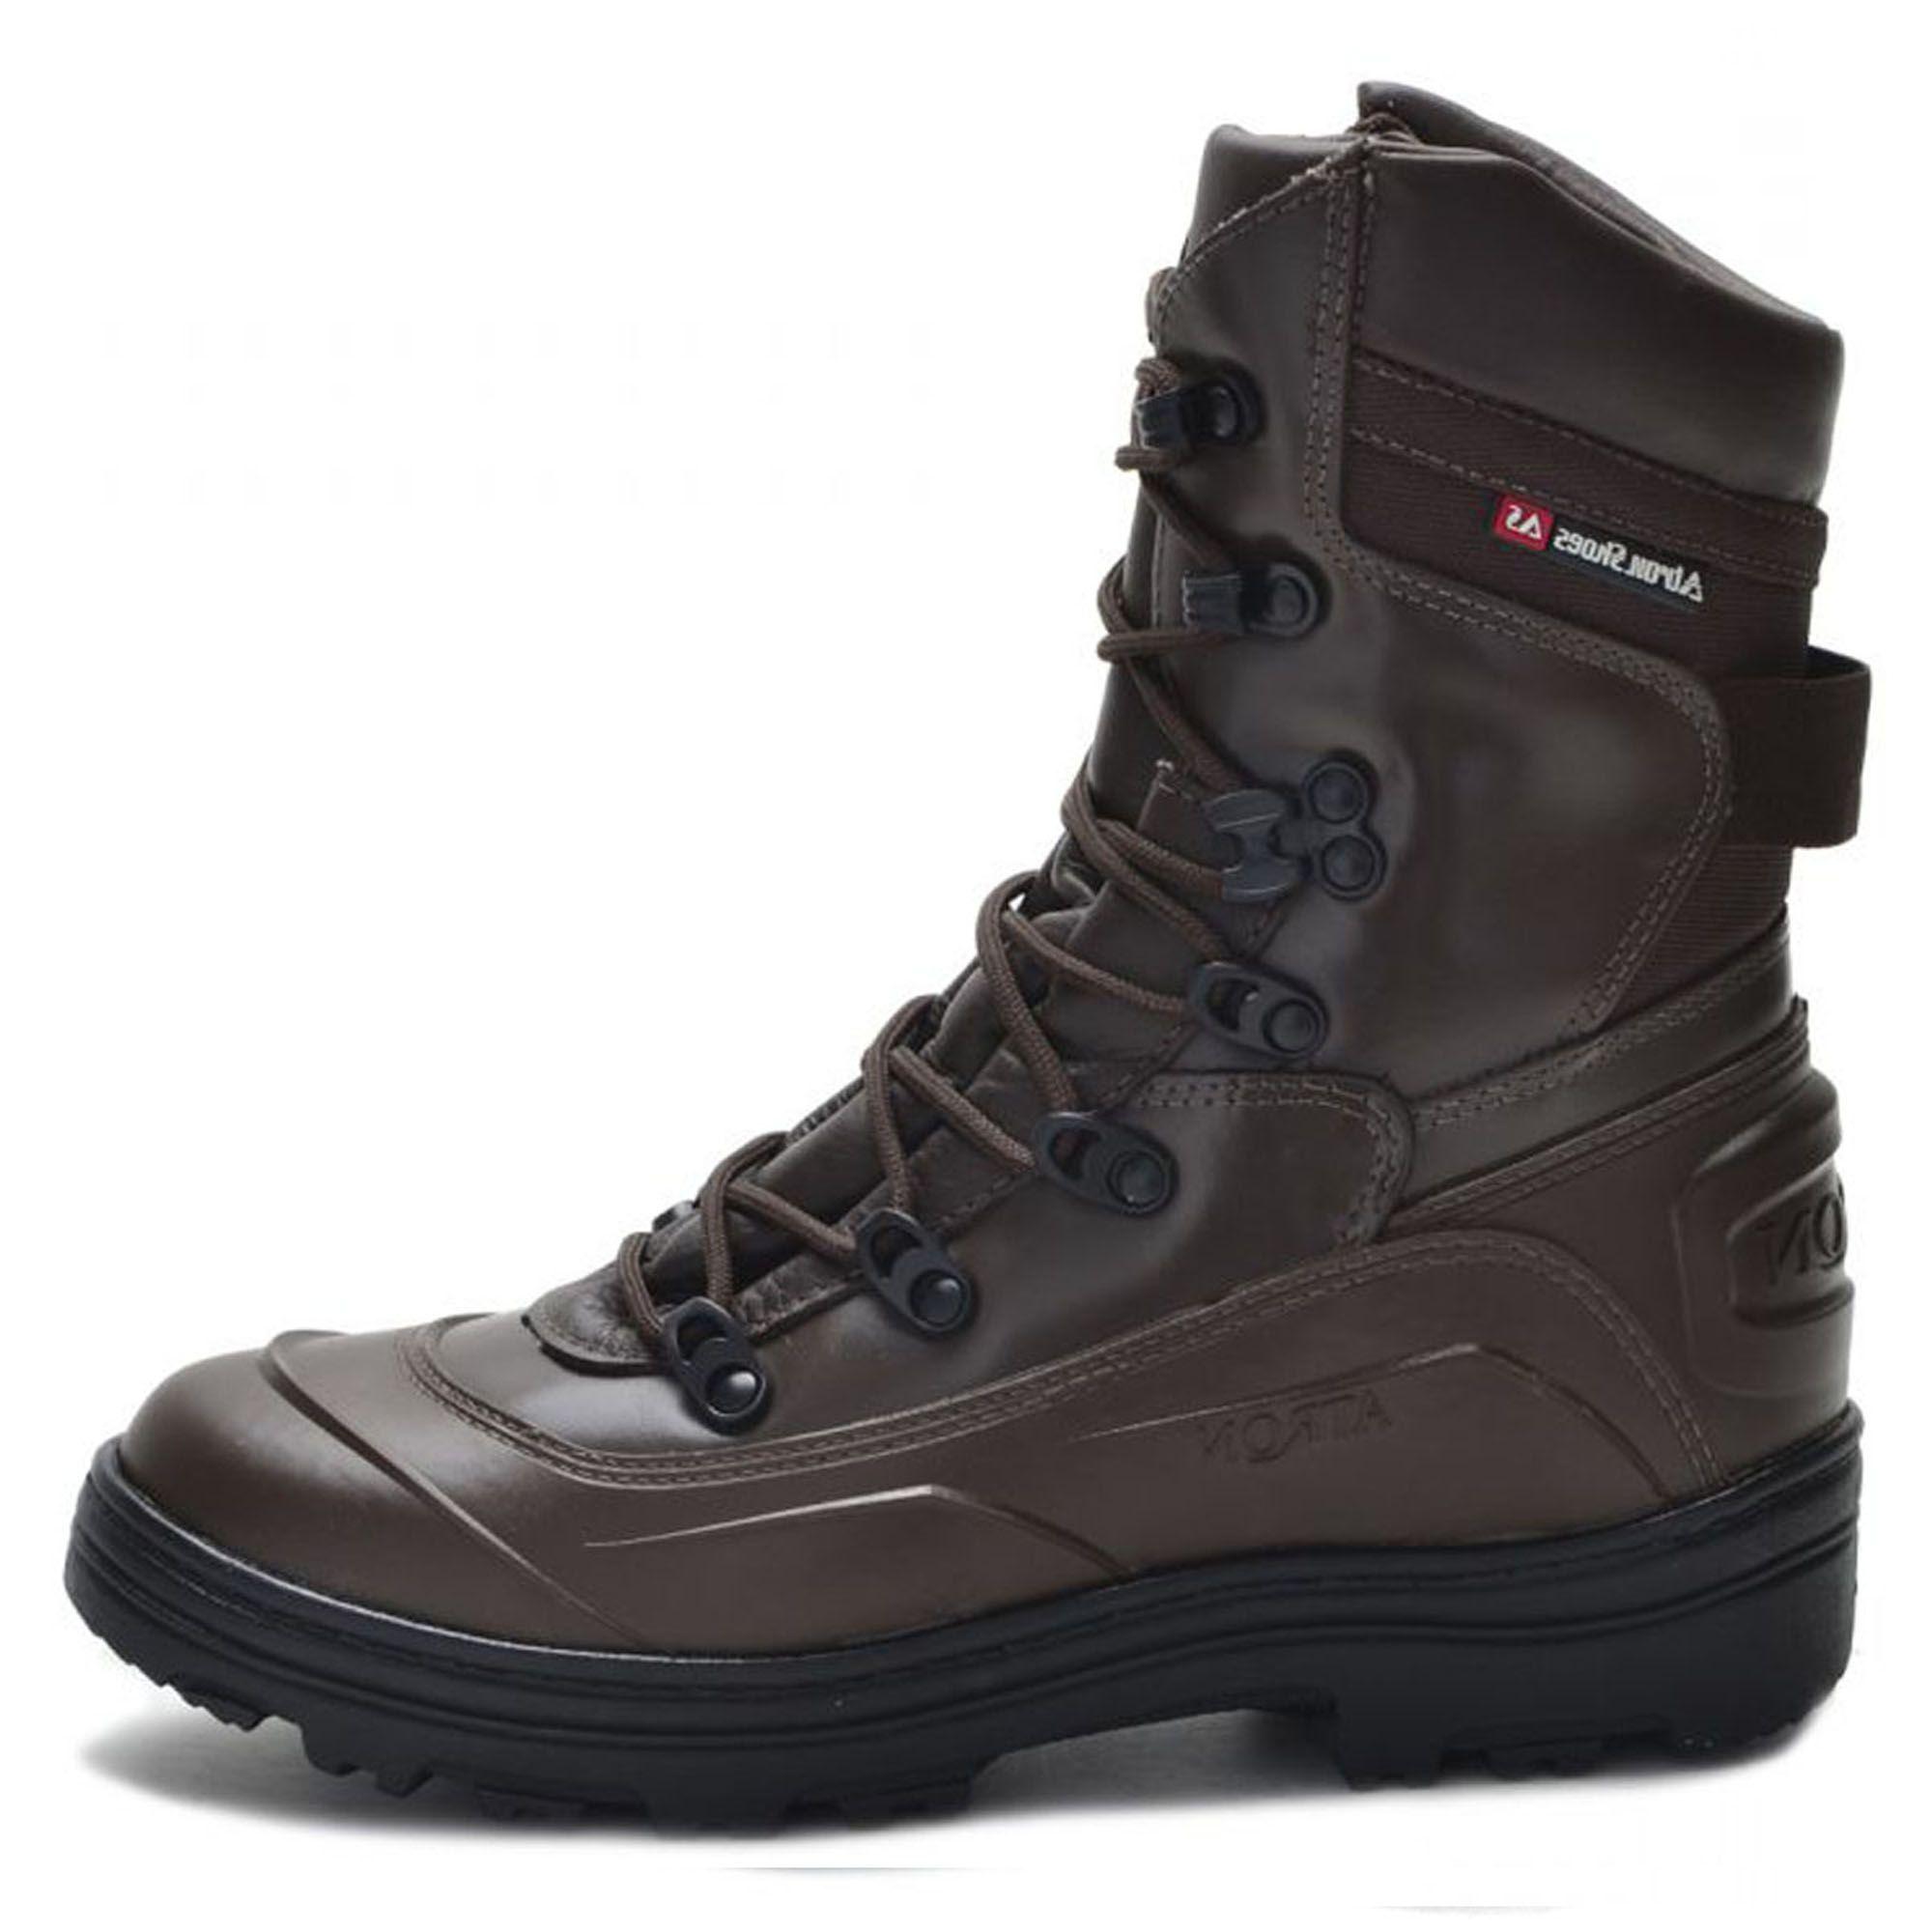 6b50d30a0 Coturno tático militar de couro Atron Shoes 289 Café